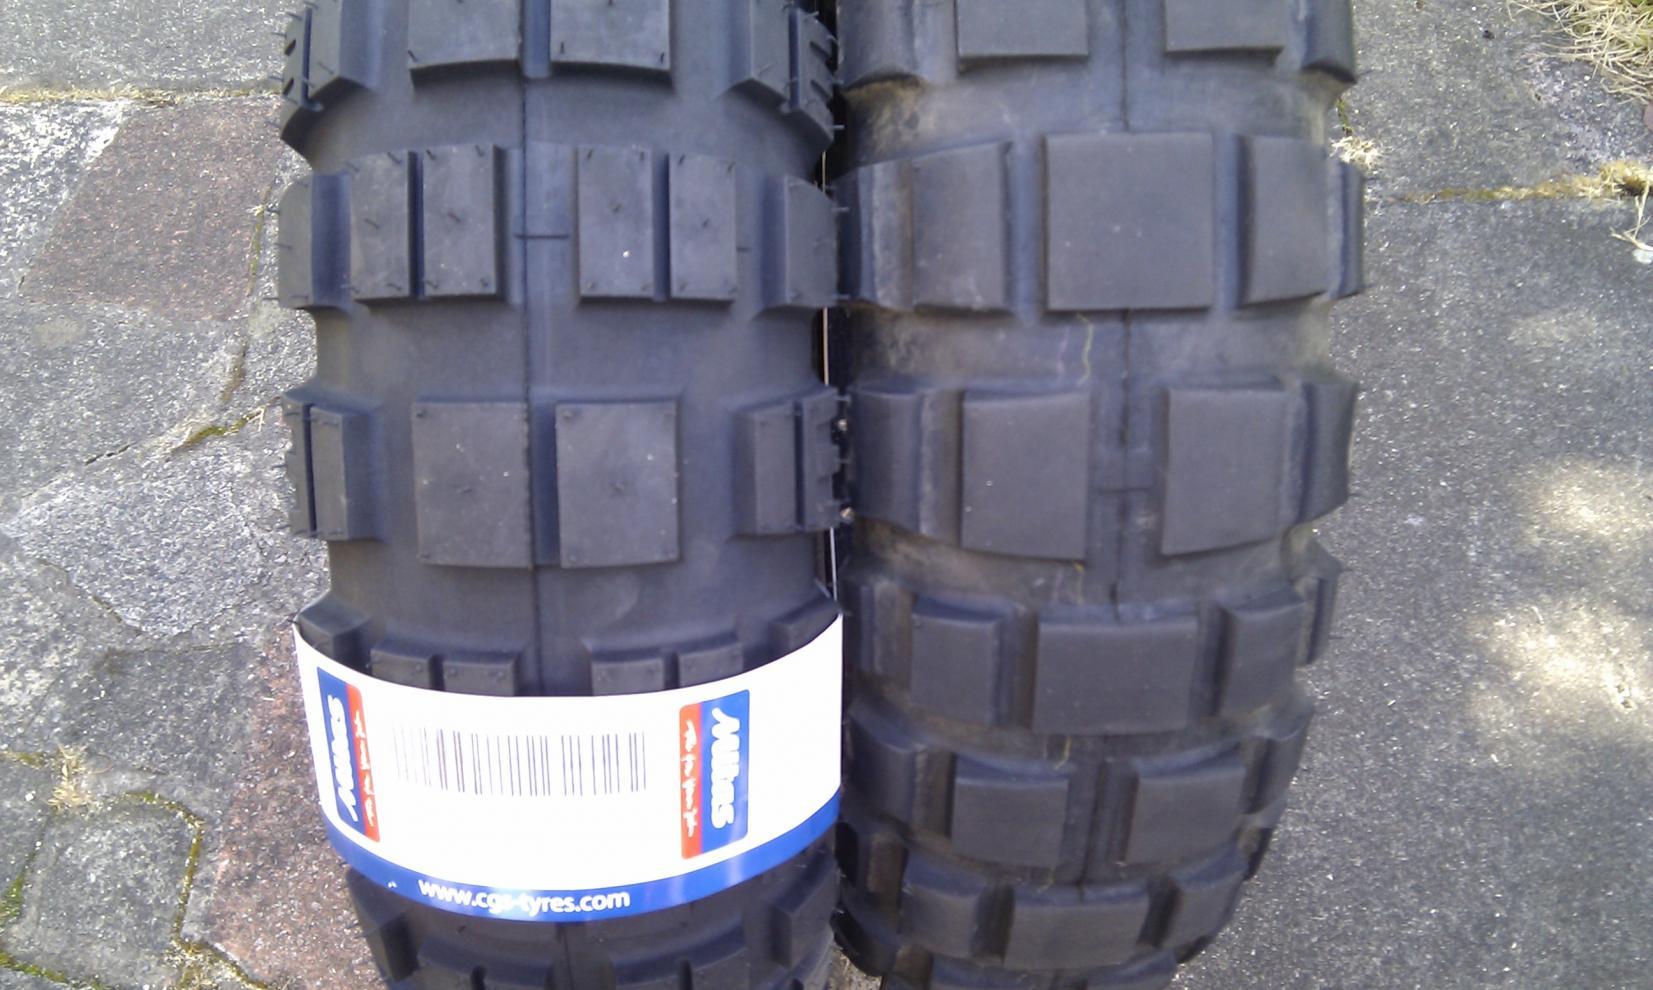 14518d1313583644-mitas-e-10-adventure-tyres-imag0376.jpg